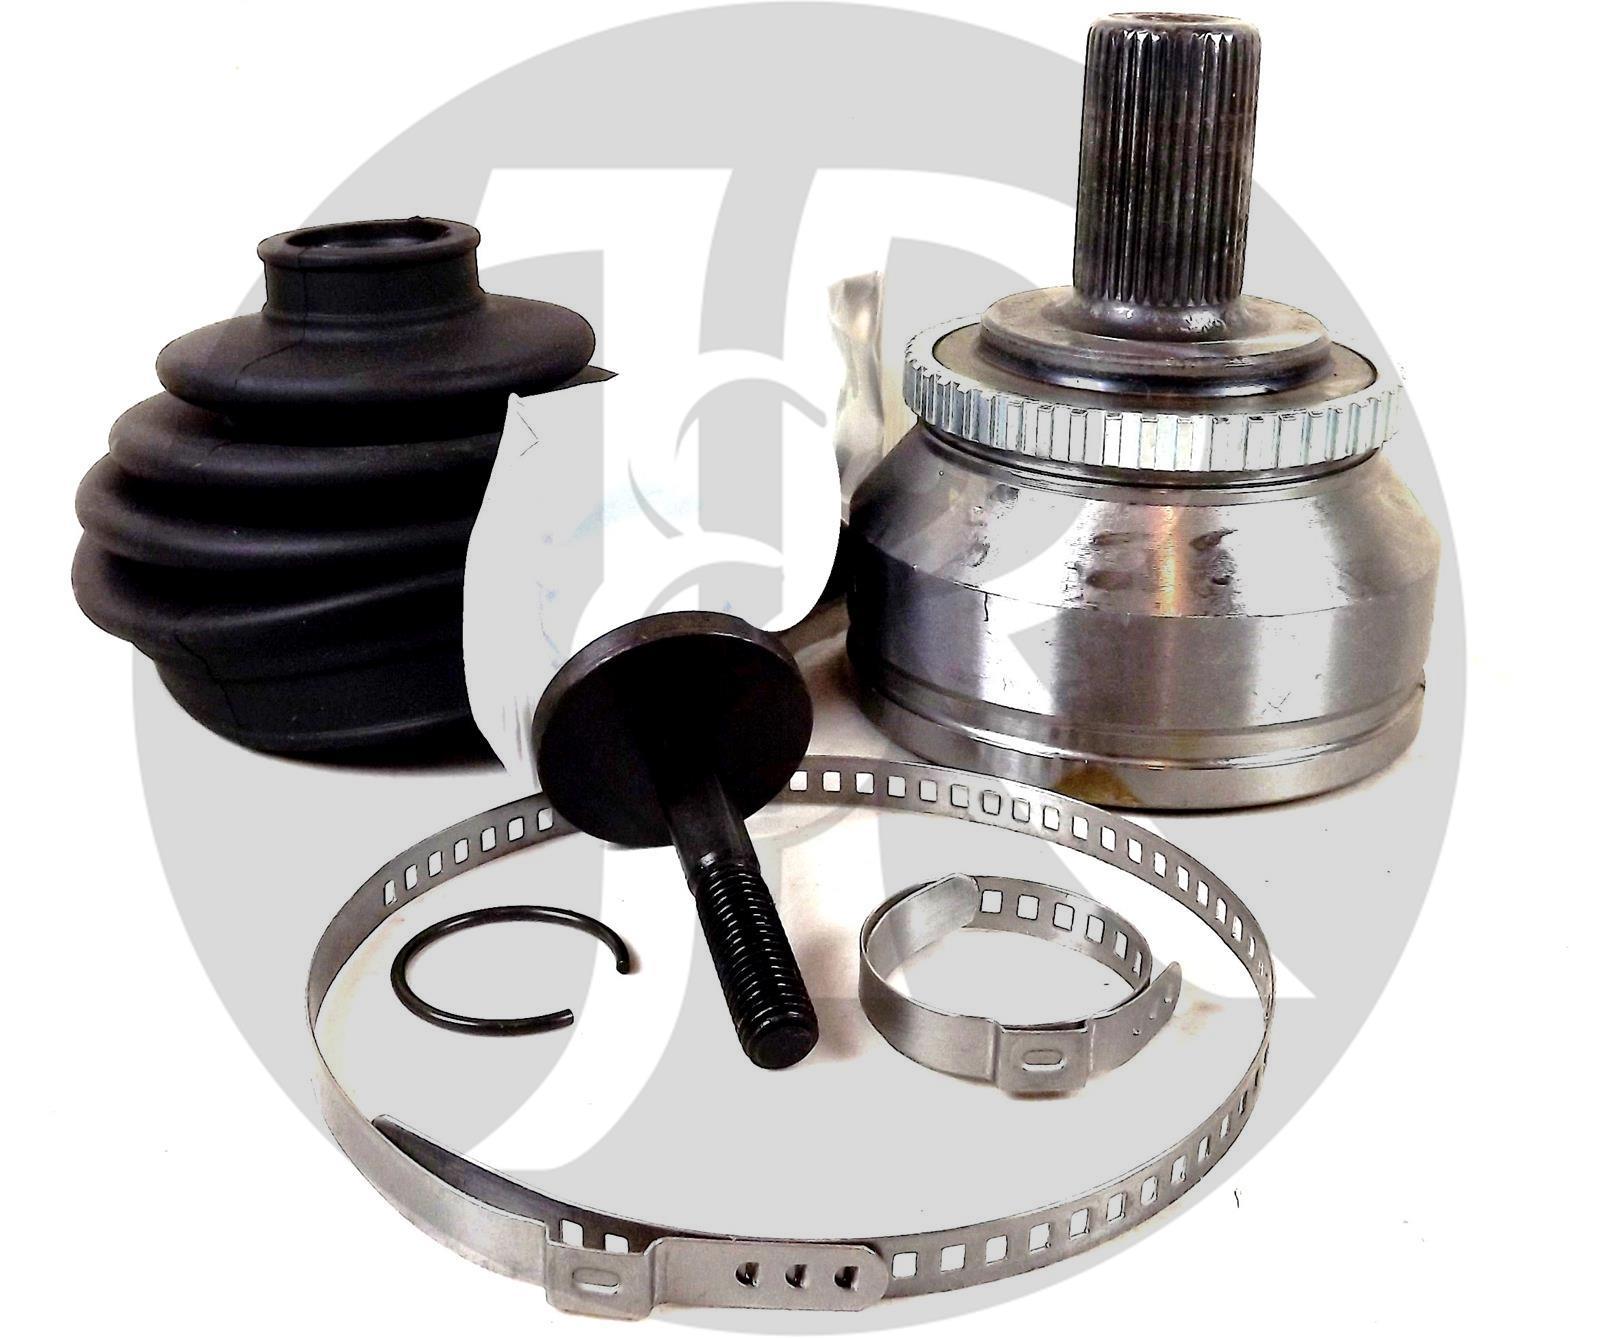 VOLVO XC90 2.4 turbo Diesel Cv joint-driveshaft cv joint /& boot kit 2002 /& gtonwards